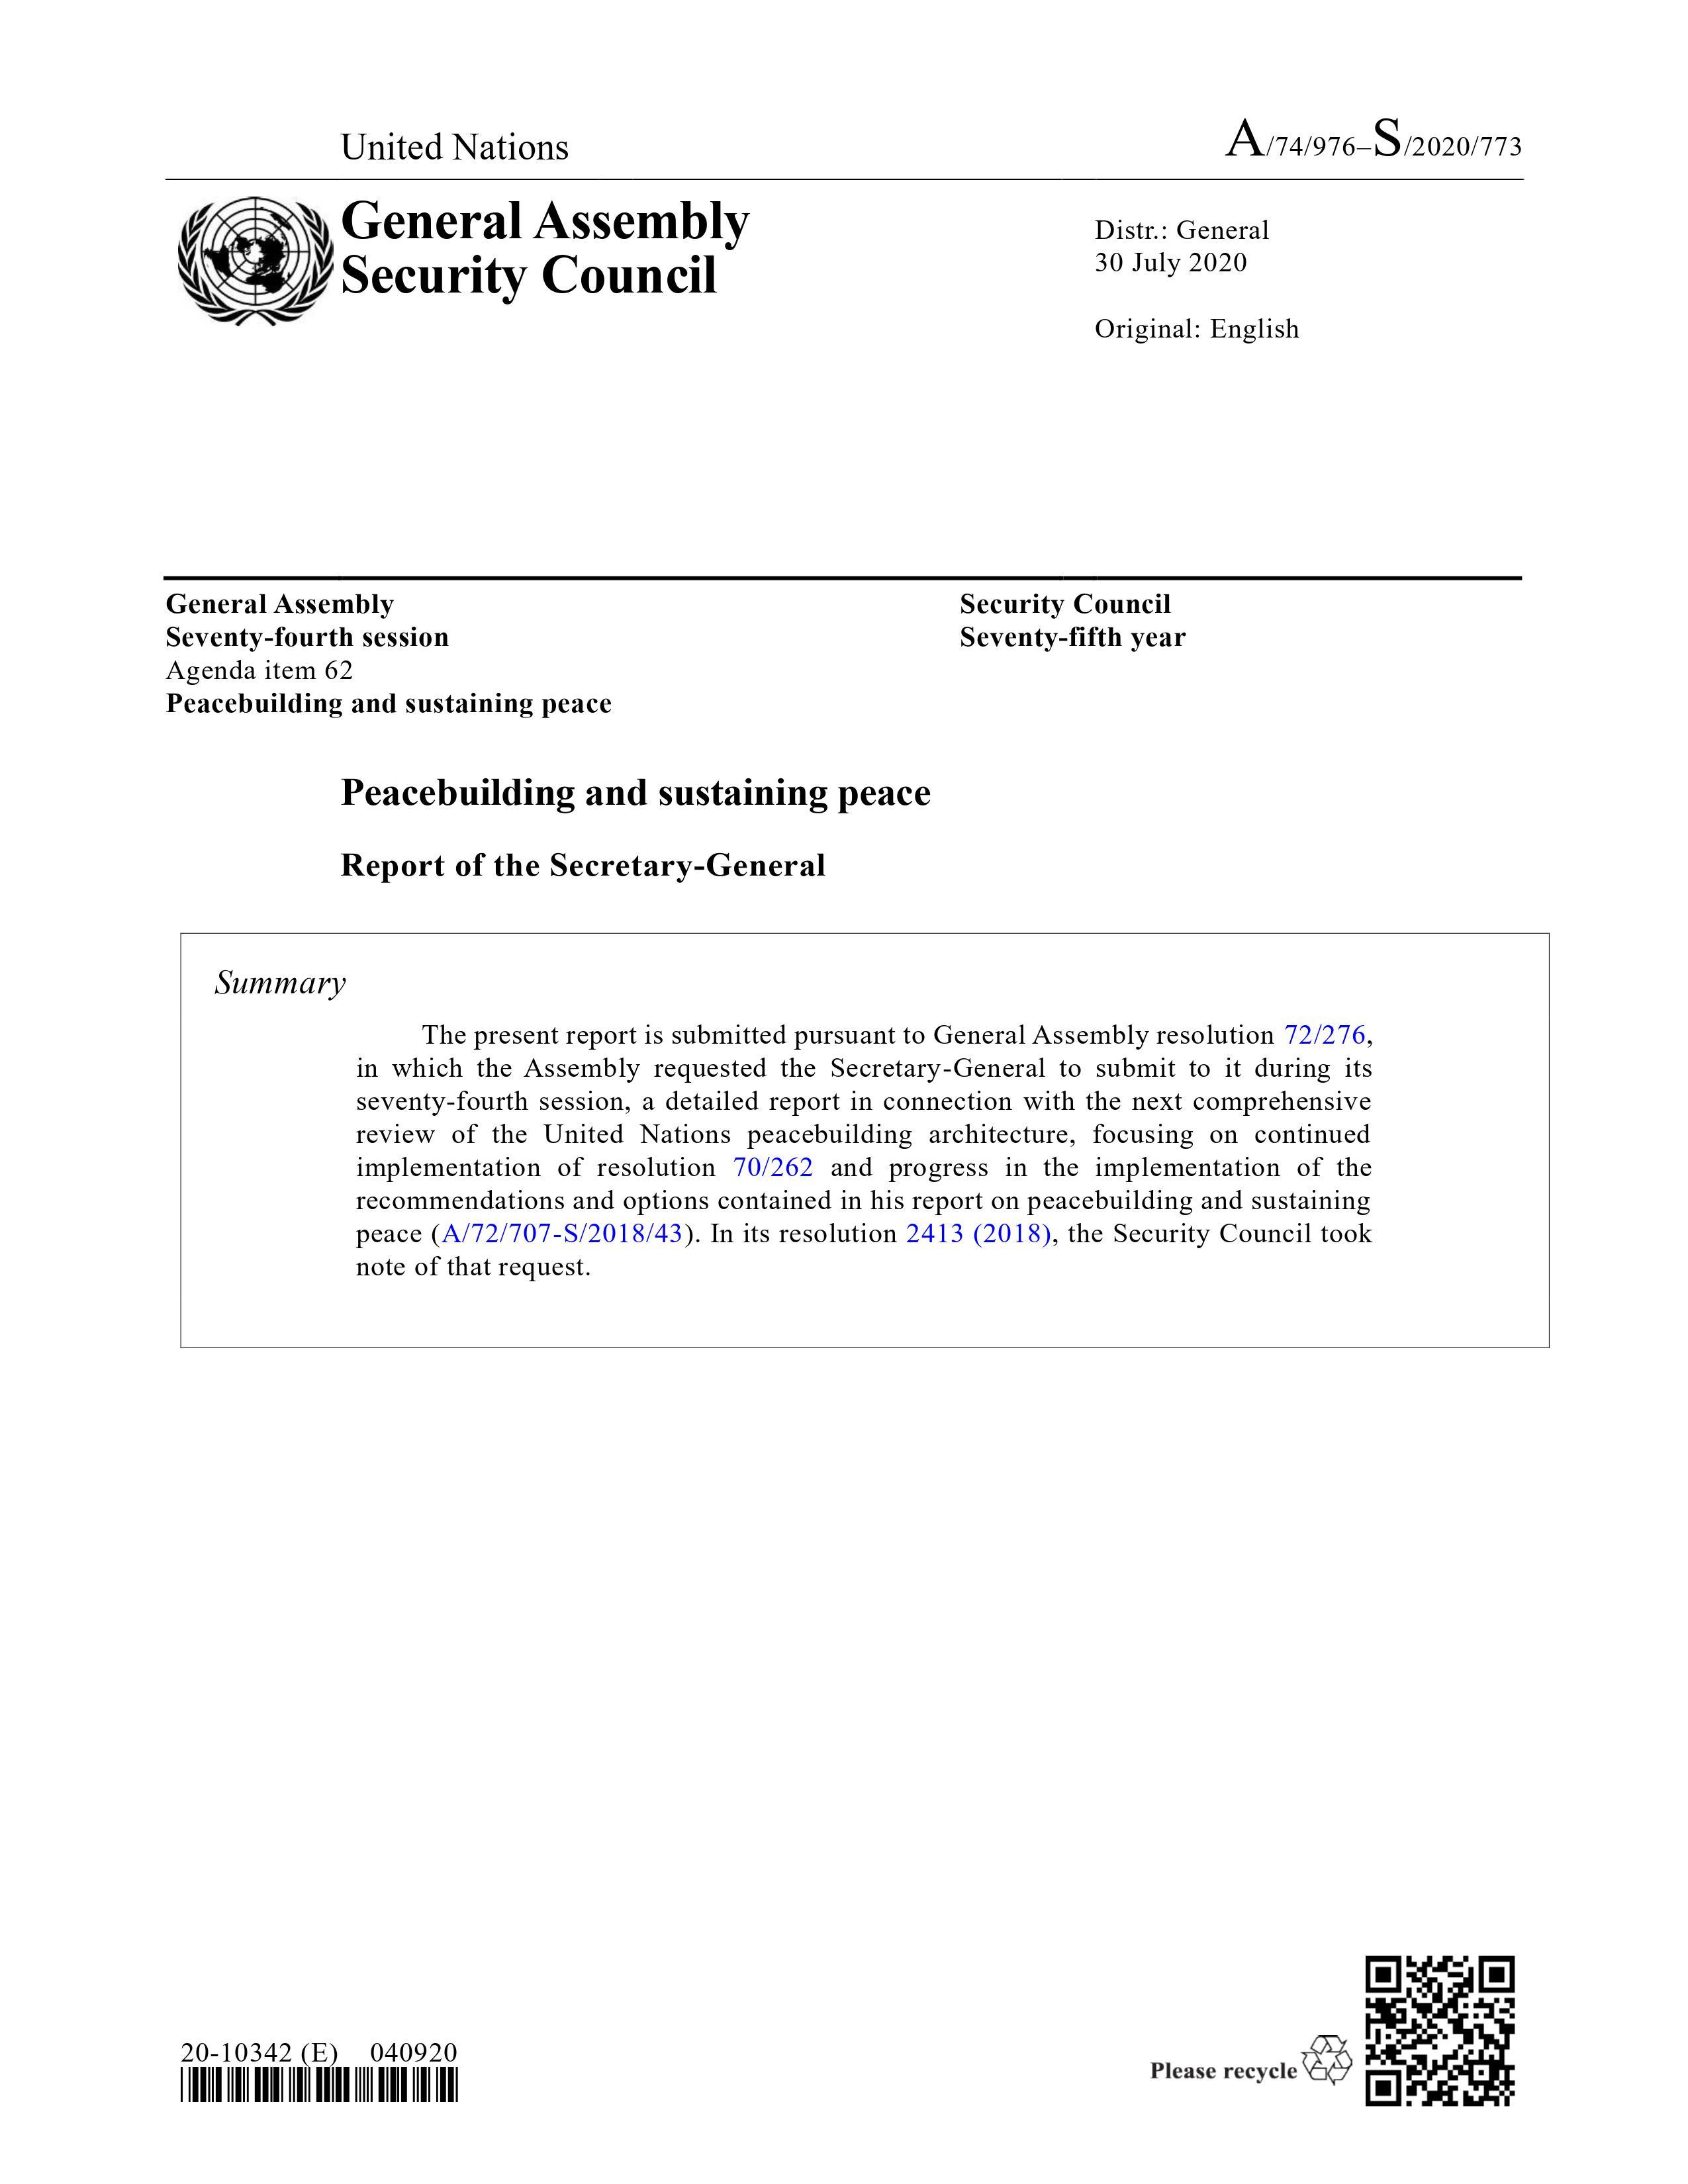 SG Report 2020